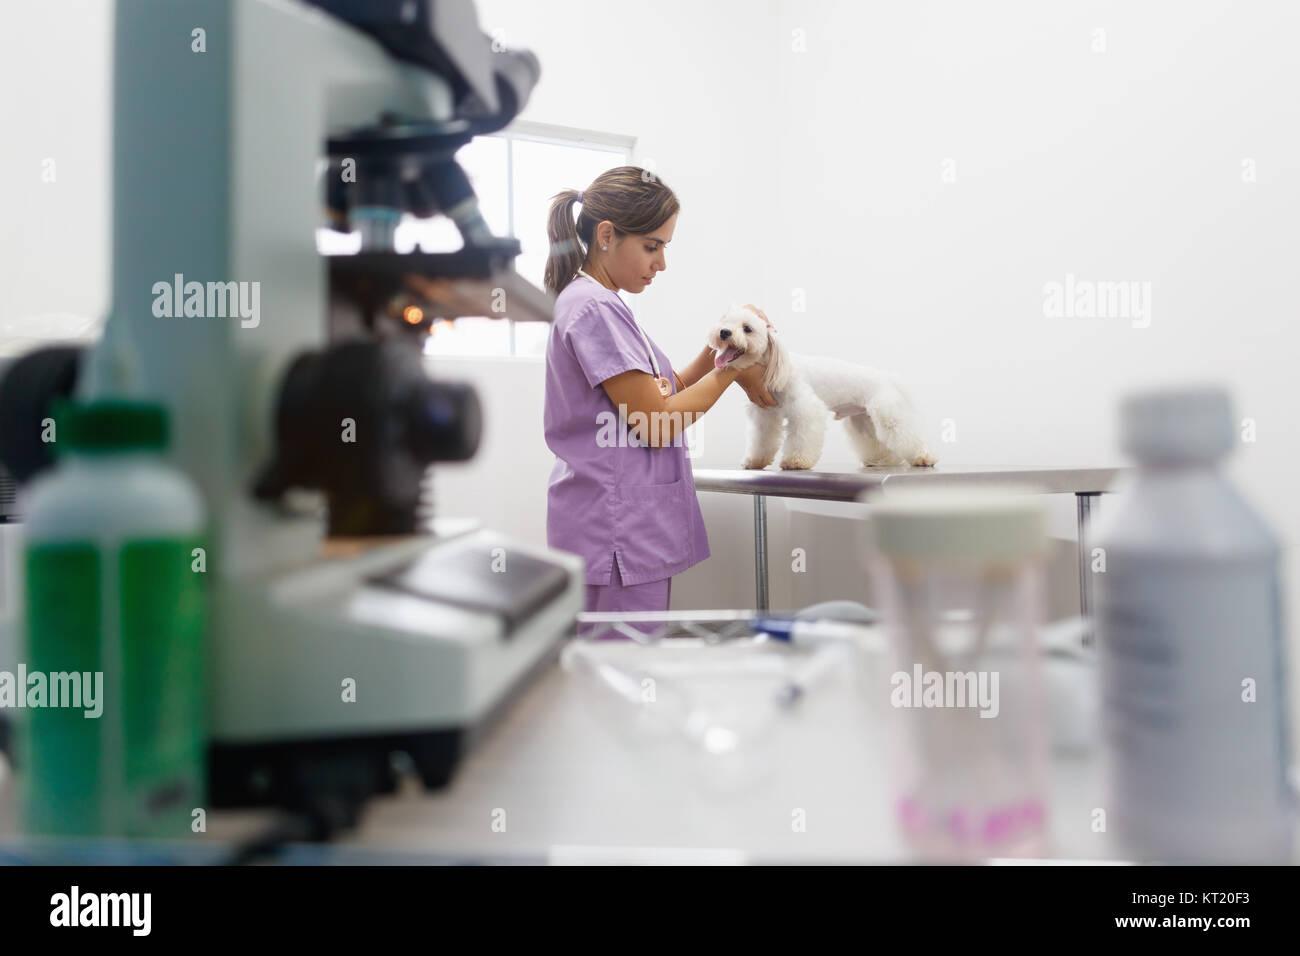 Pets At Home Martlesham Dog Grooming